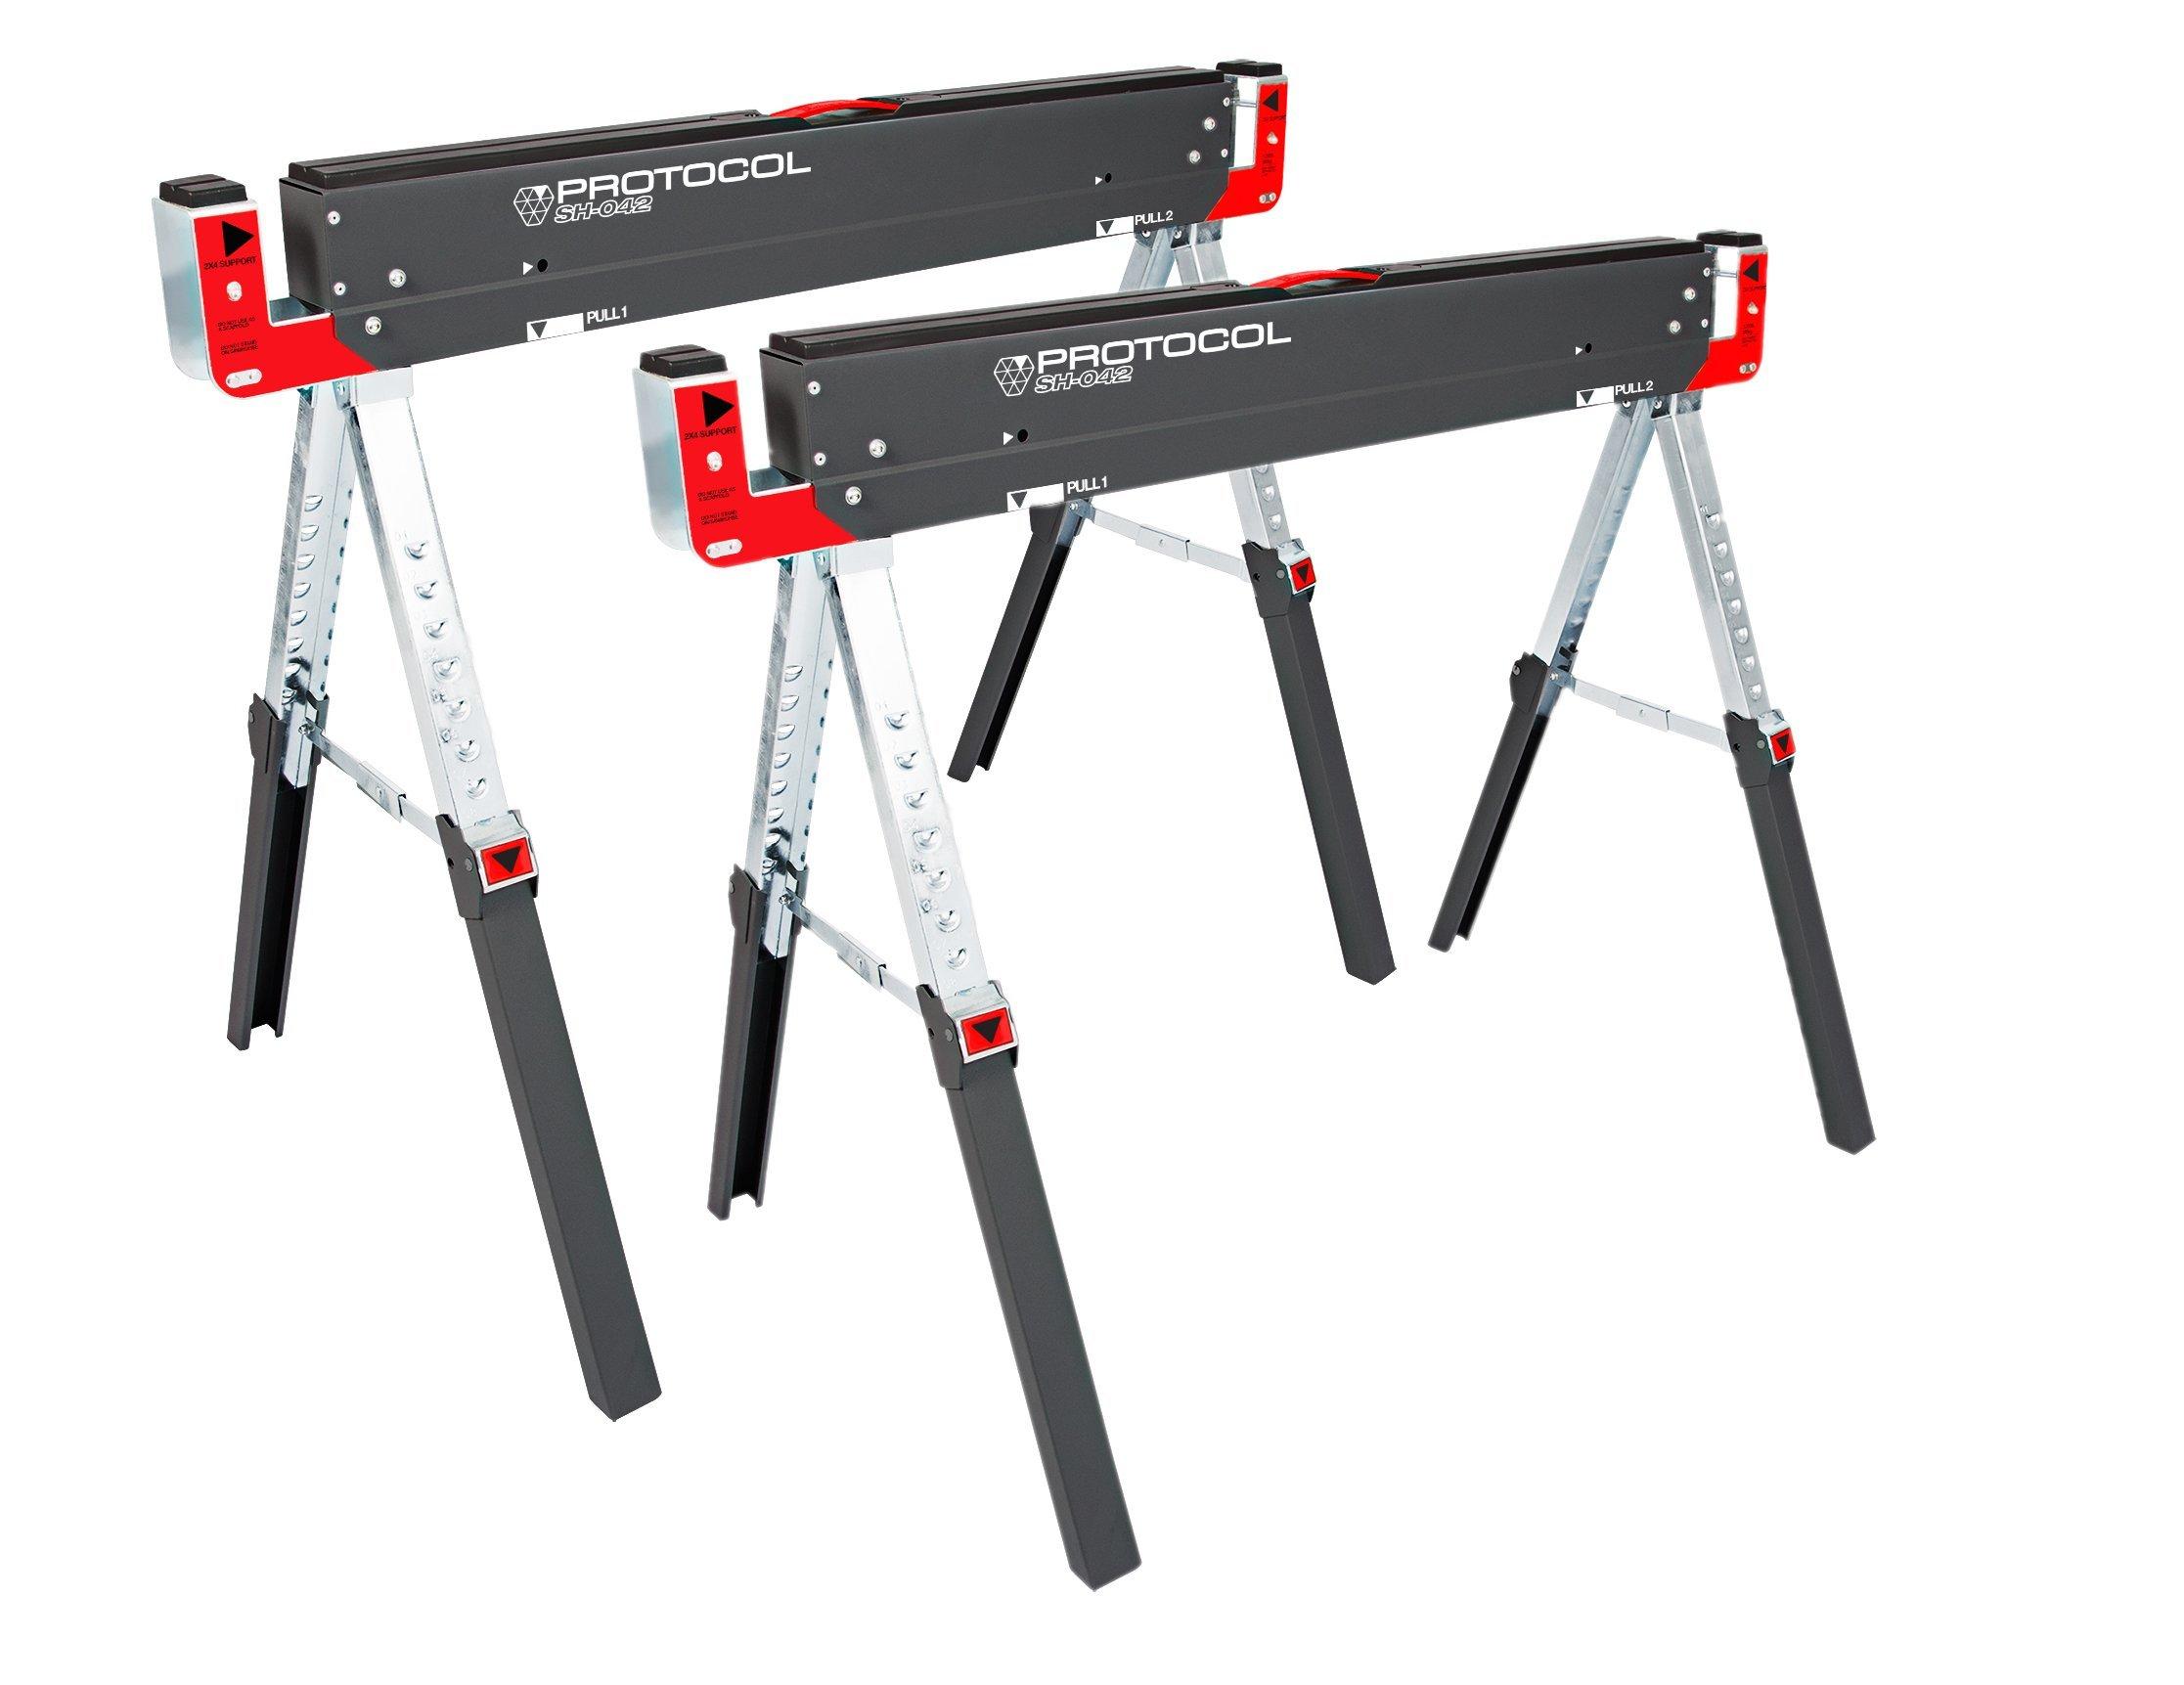 PROTOCOL Equipment SH-042 Work Shop Adjustable Sawhorse, Set of 2